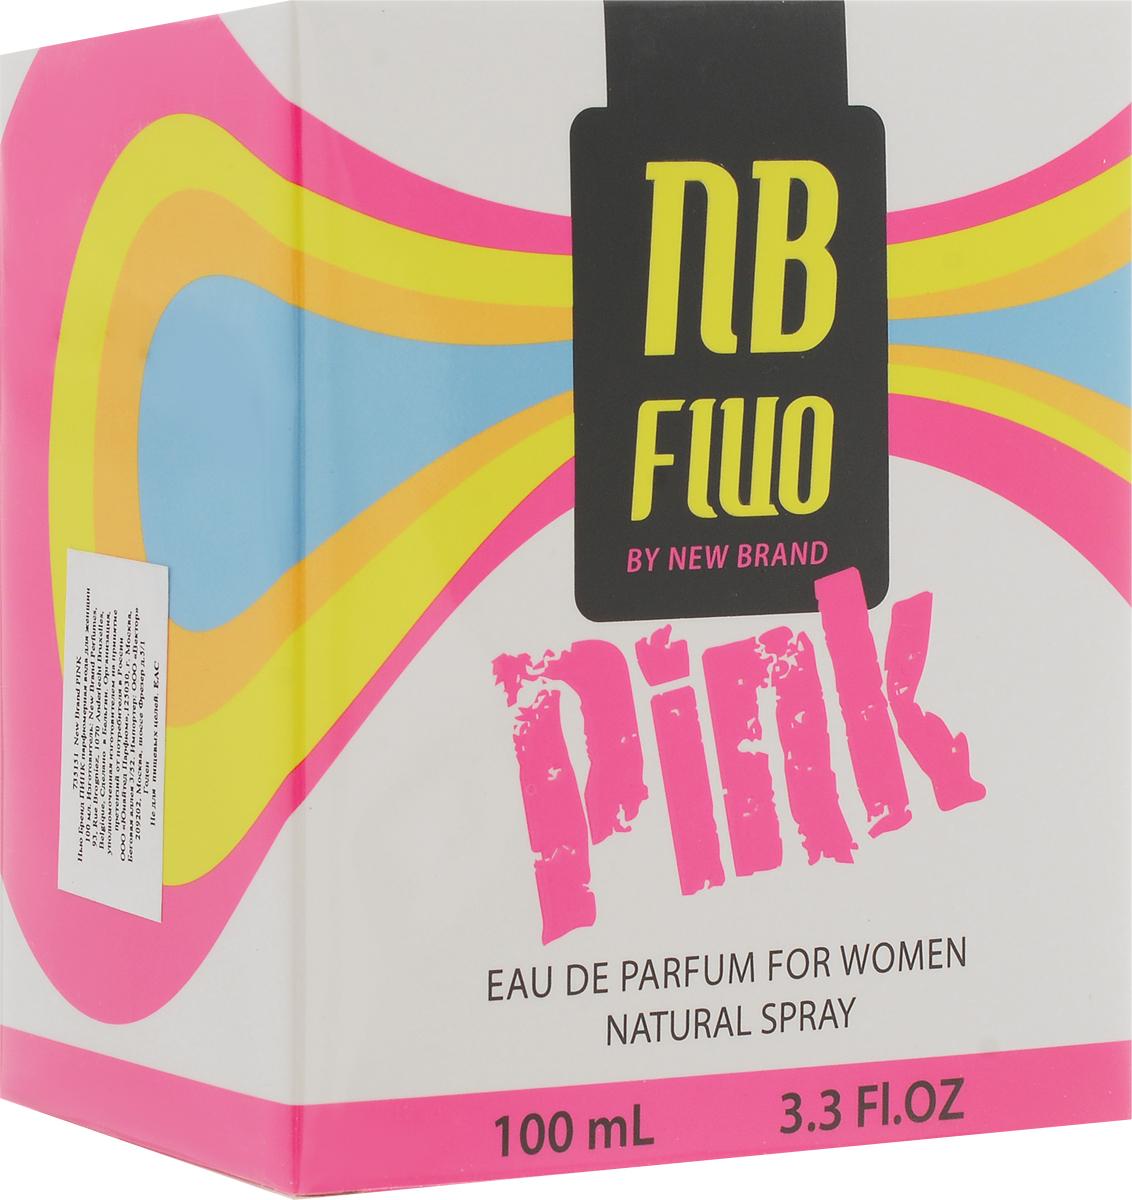 New Brand Perfumes Парфюмерная вода для женщин Pink, 100 мл - Парфюмерия